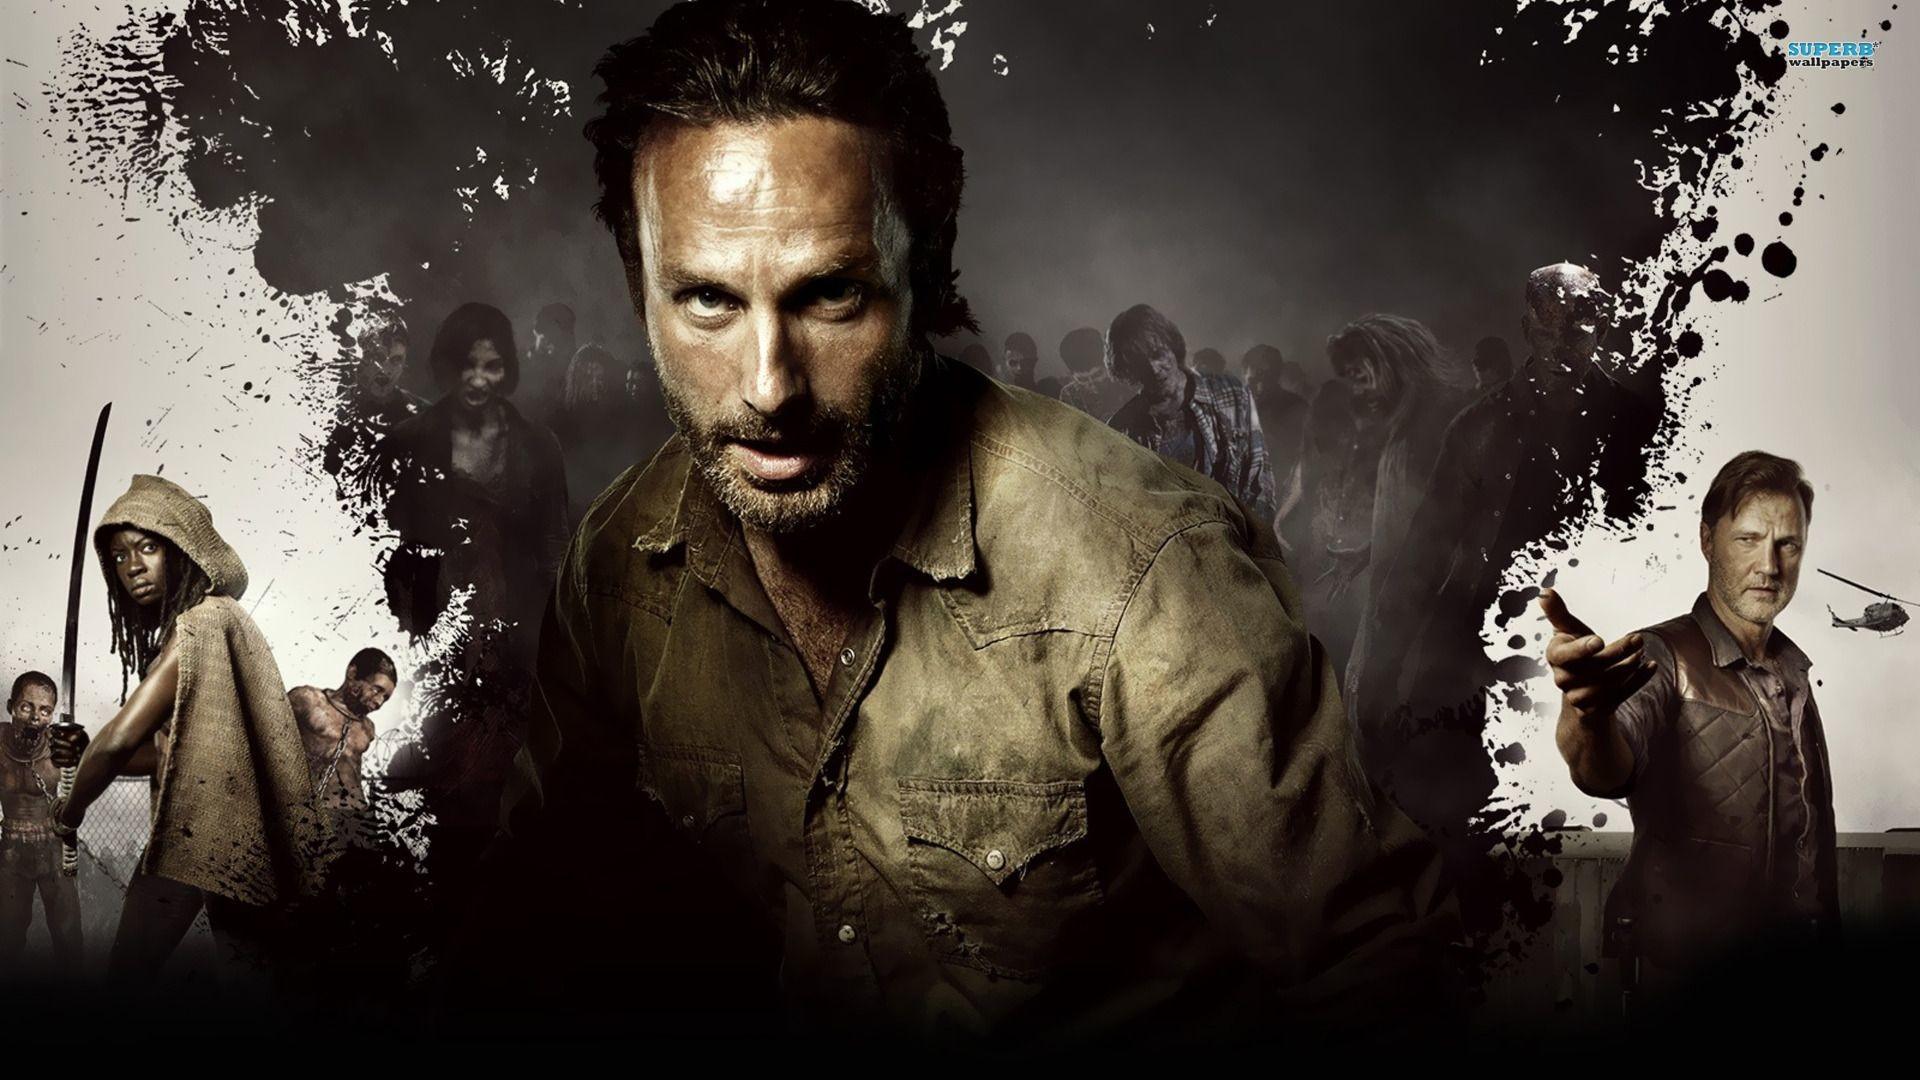 The Walking Dead Desktop Wallpapers Wallpapers | HD Wallpapers | Pinterest  | Wallpaper, Desktop backgrounds and Geometry